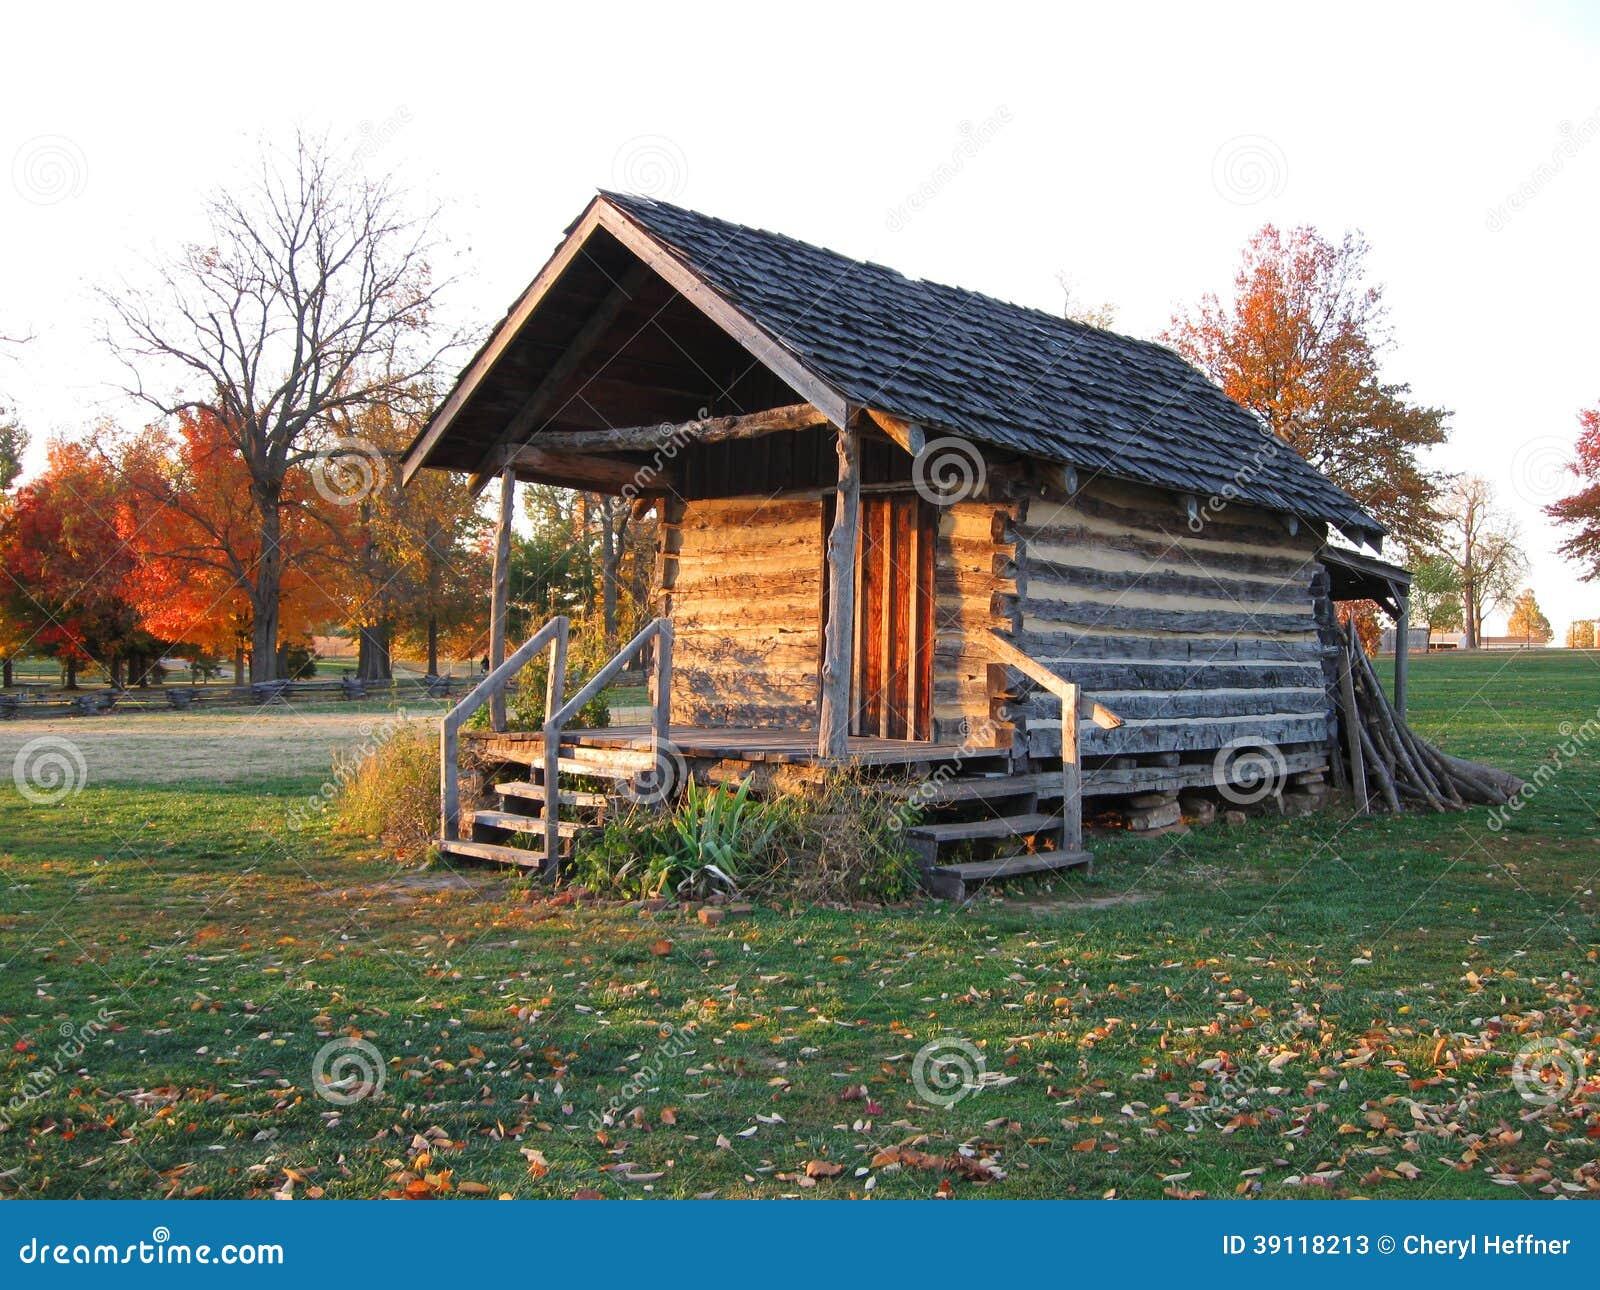 old pioneer log cabin stock image image of haunted gold 39118213. Black Bedroom Furniture Sets. Home Design Ideas